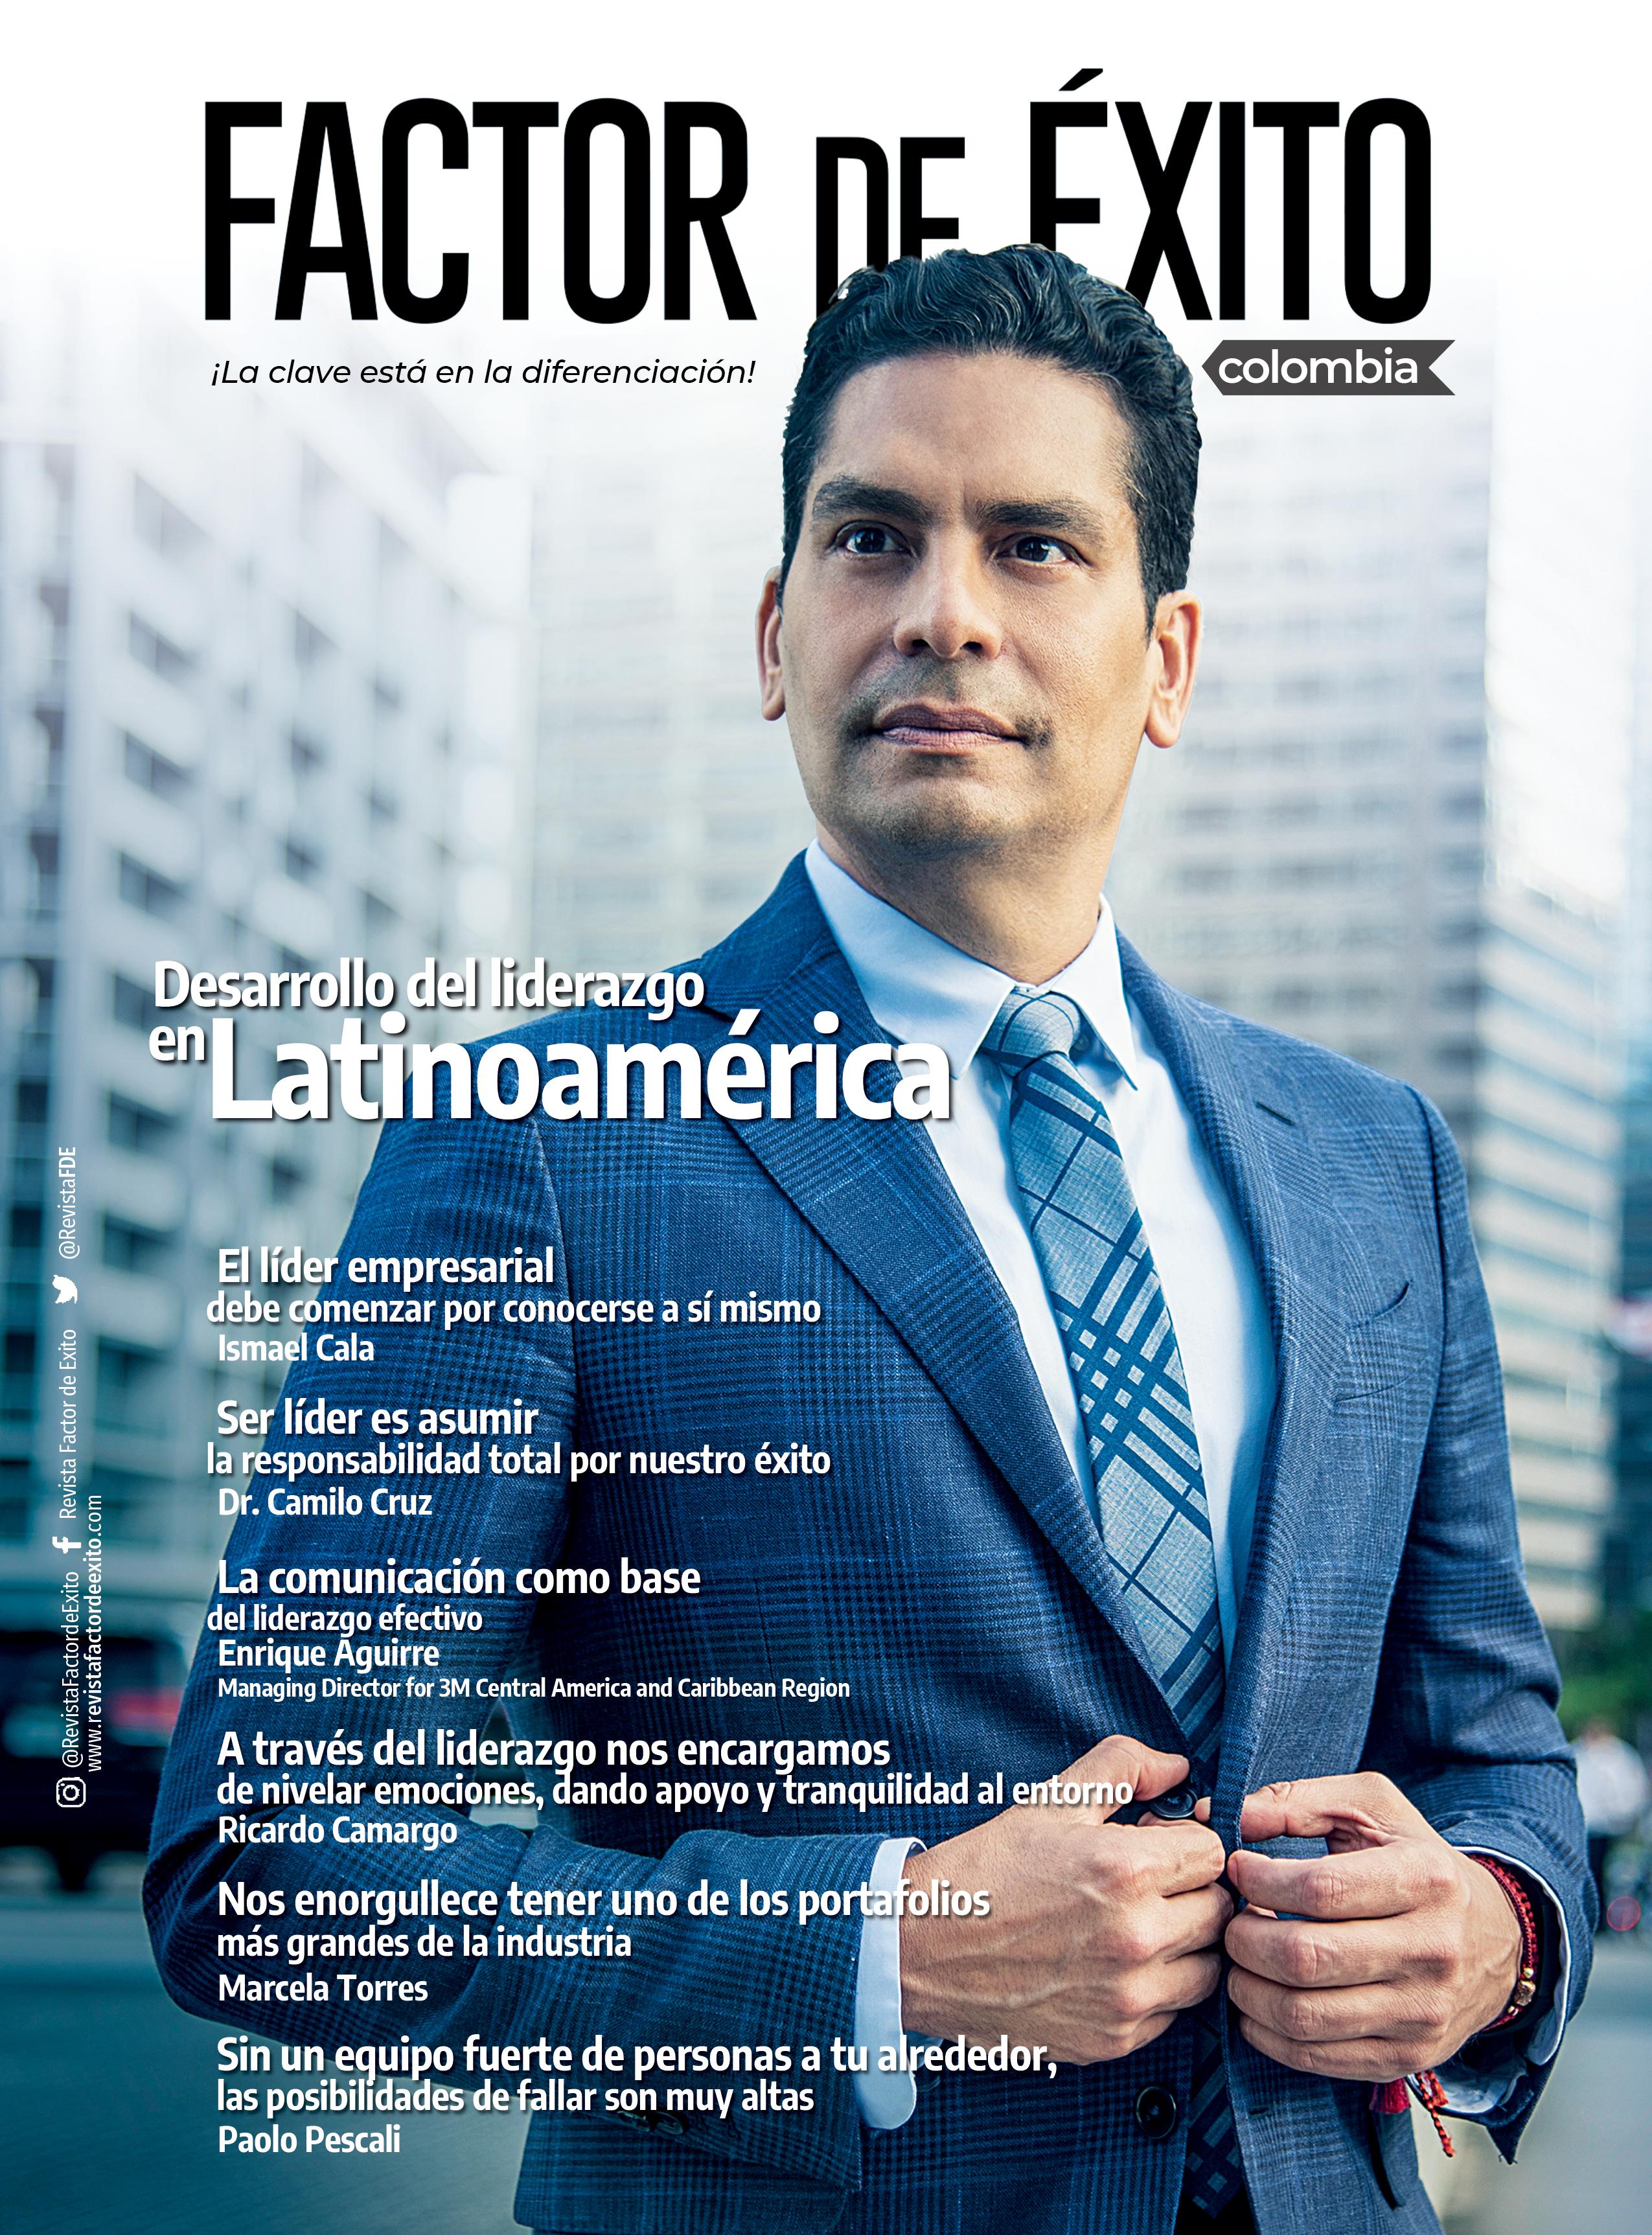 COLOMBIA edición #1 Revista Factor de Éxito